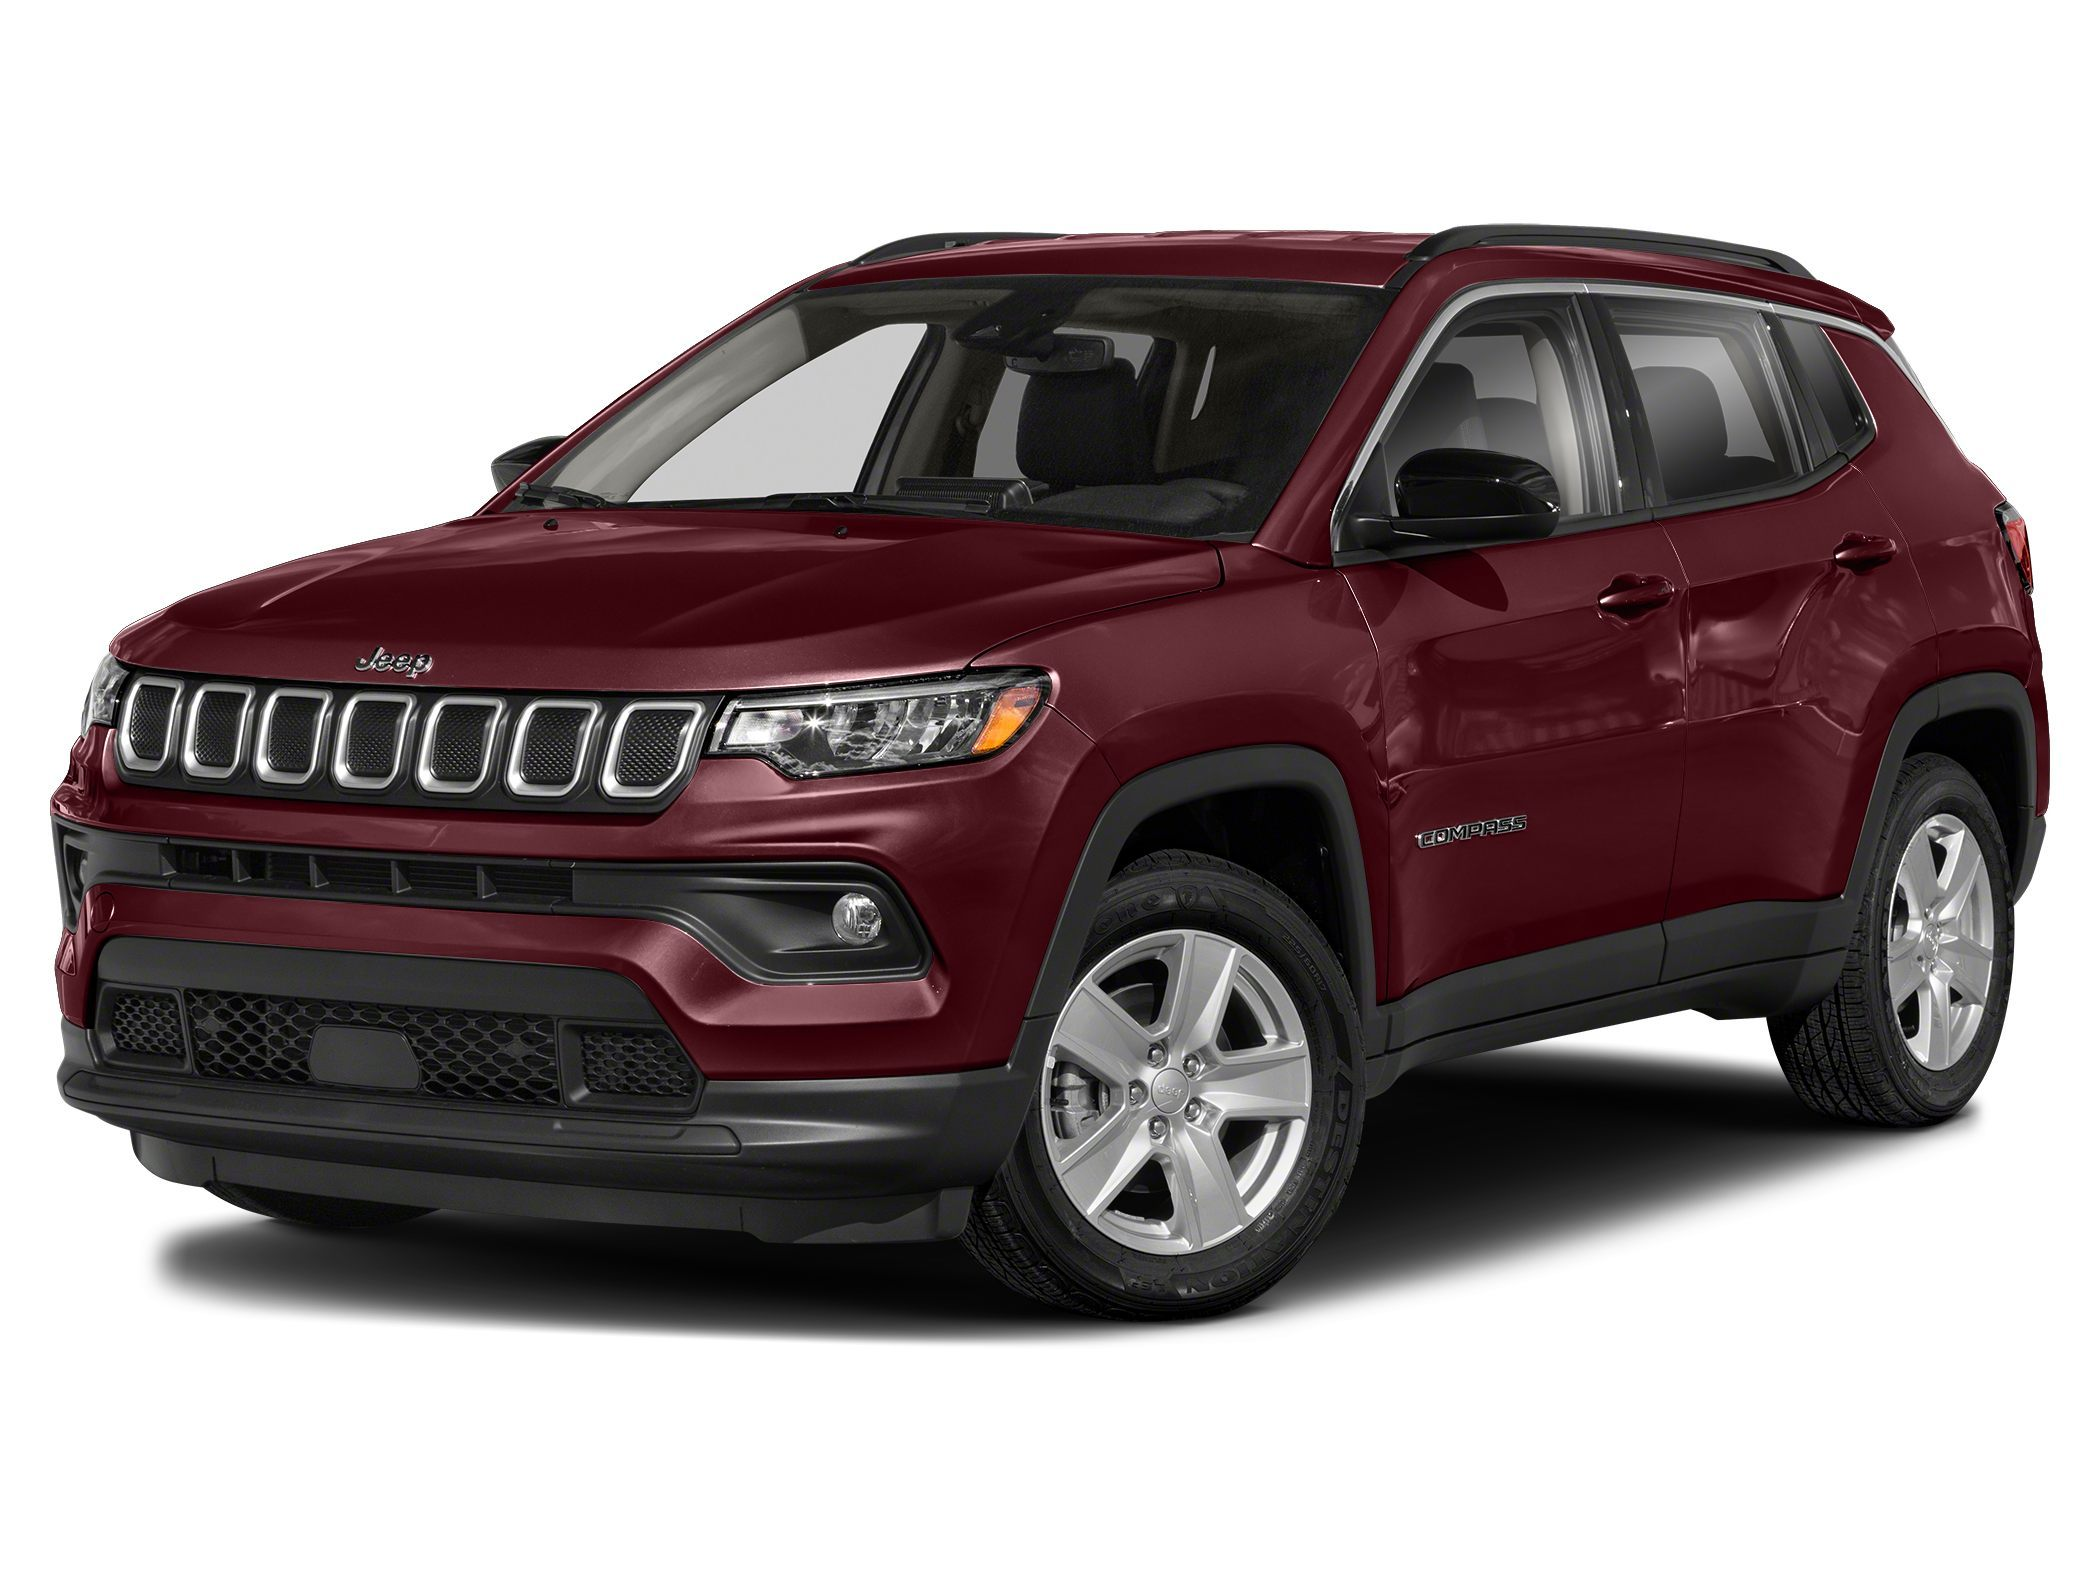 2022 Jeep Compass 4x4